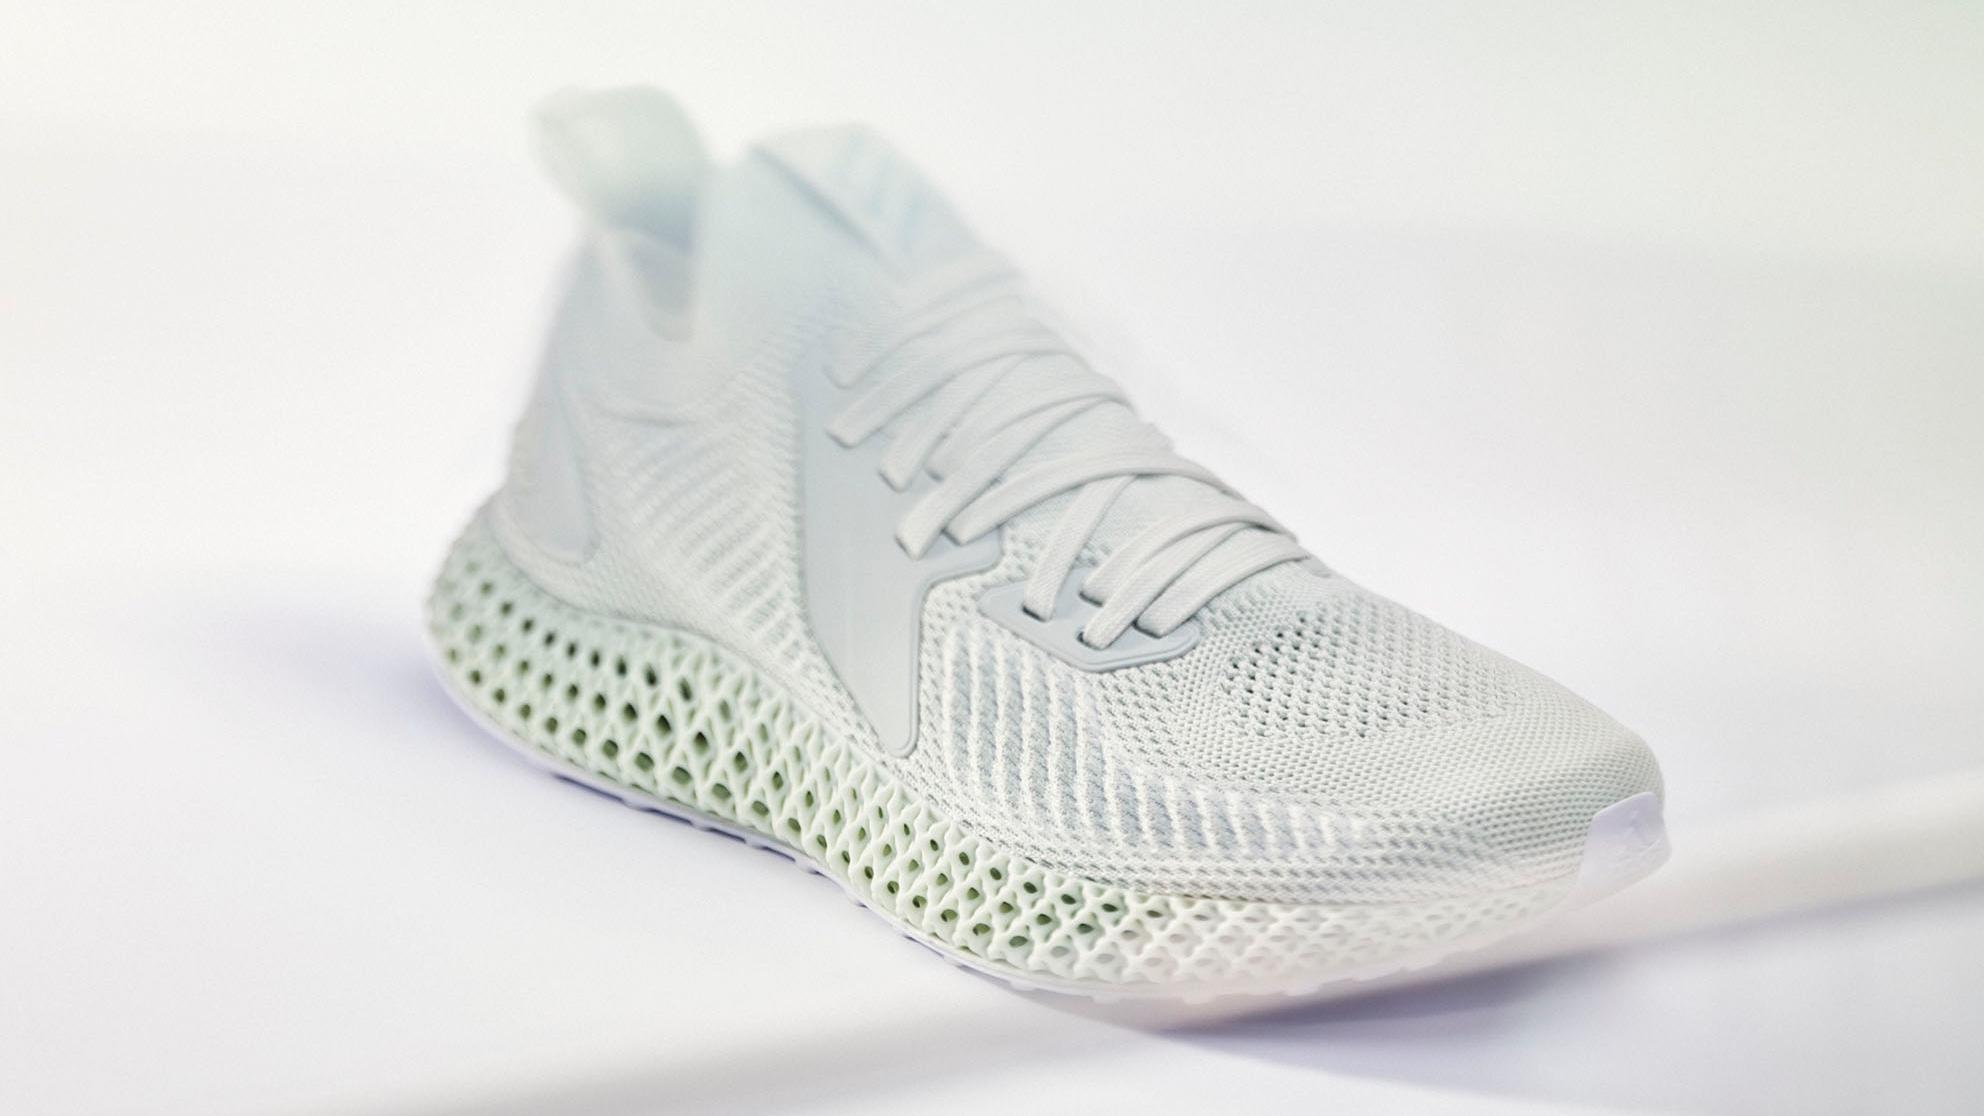 adidas x Parley: ALPHAEDGE 4D — PARLEY